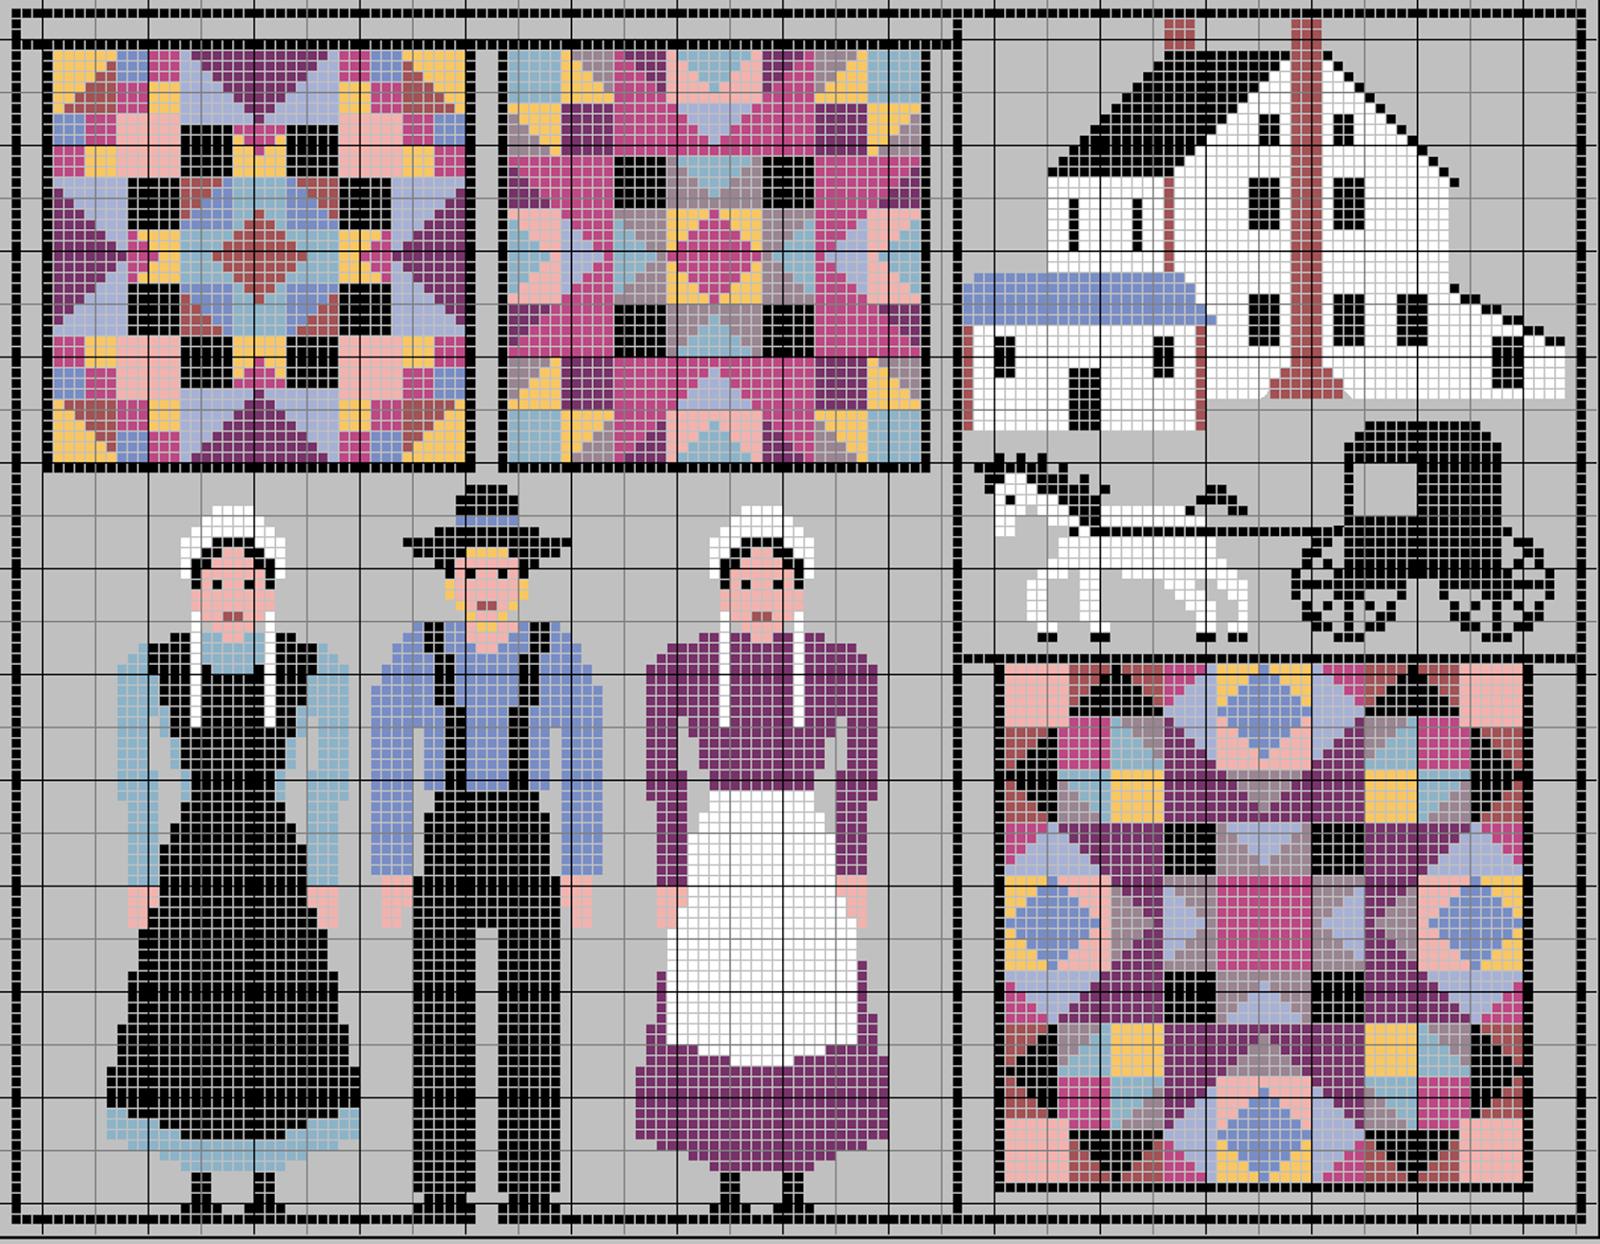 Amish Life, Amish Quilts, Pattern Amish, Amish Cs, Cross Stitch Patterns